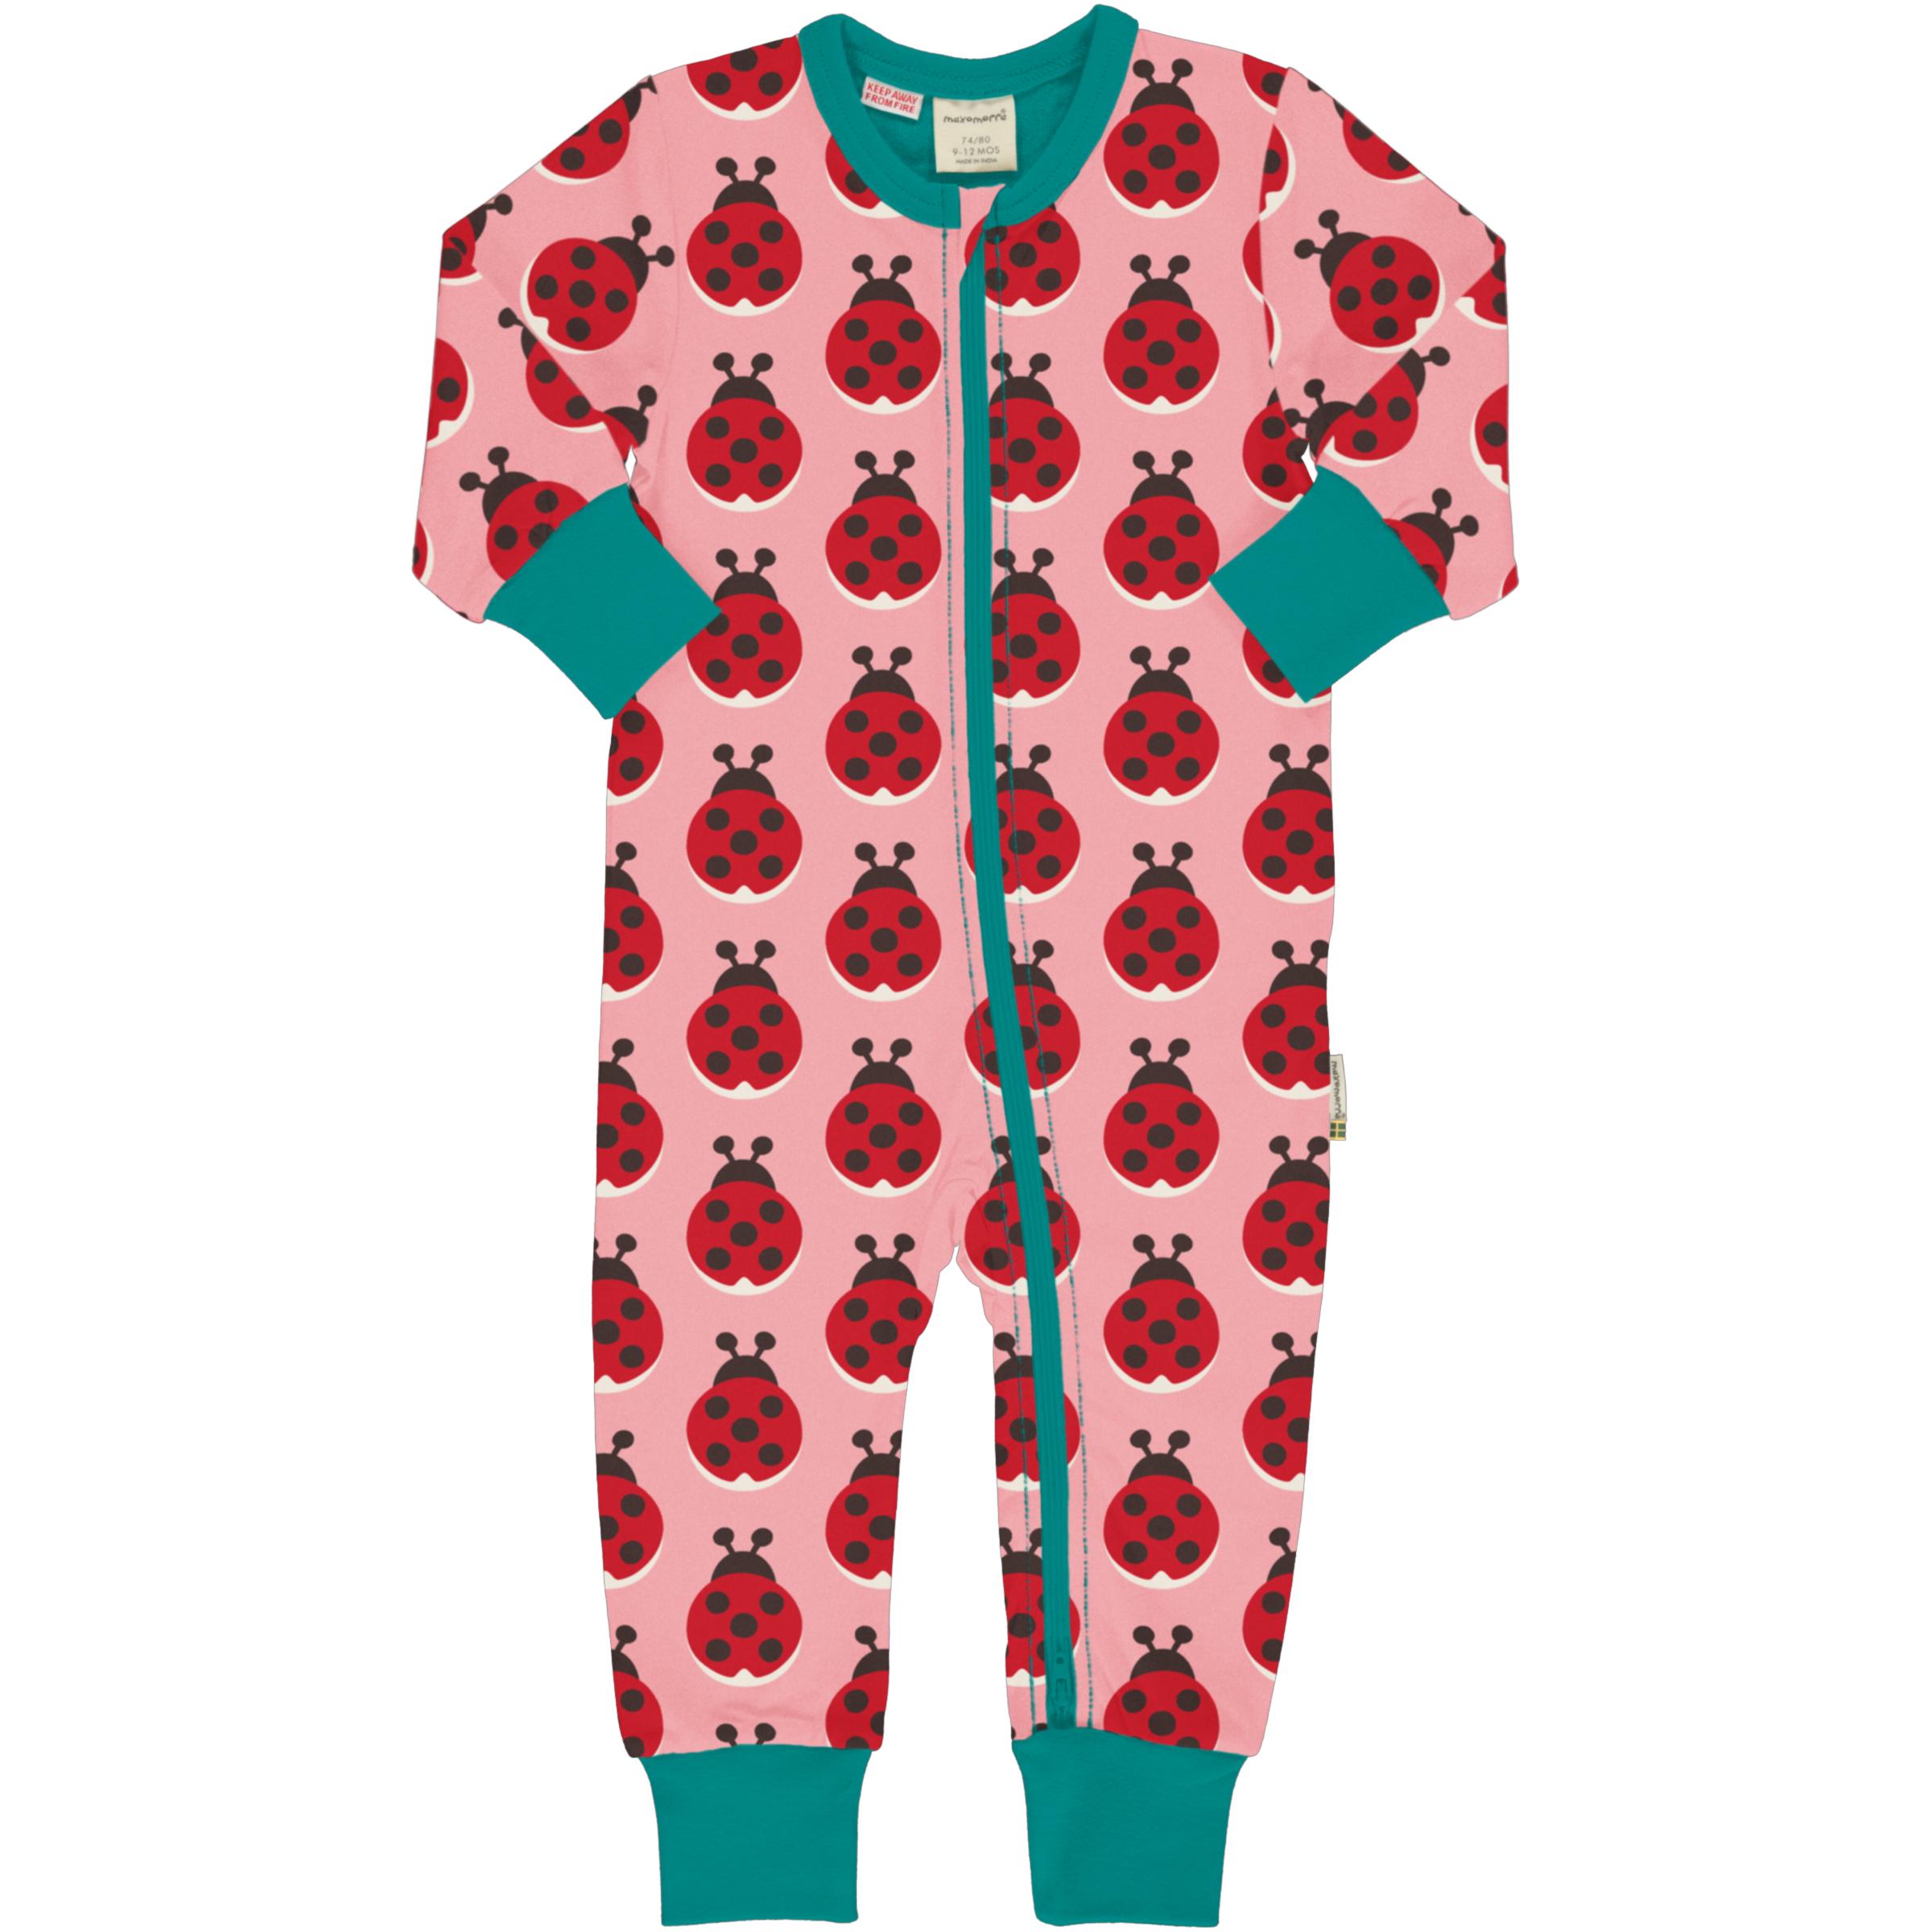 Maxomorra Baby Schlafanzug Einteiler Lang LADYBUG 086/092